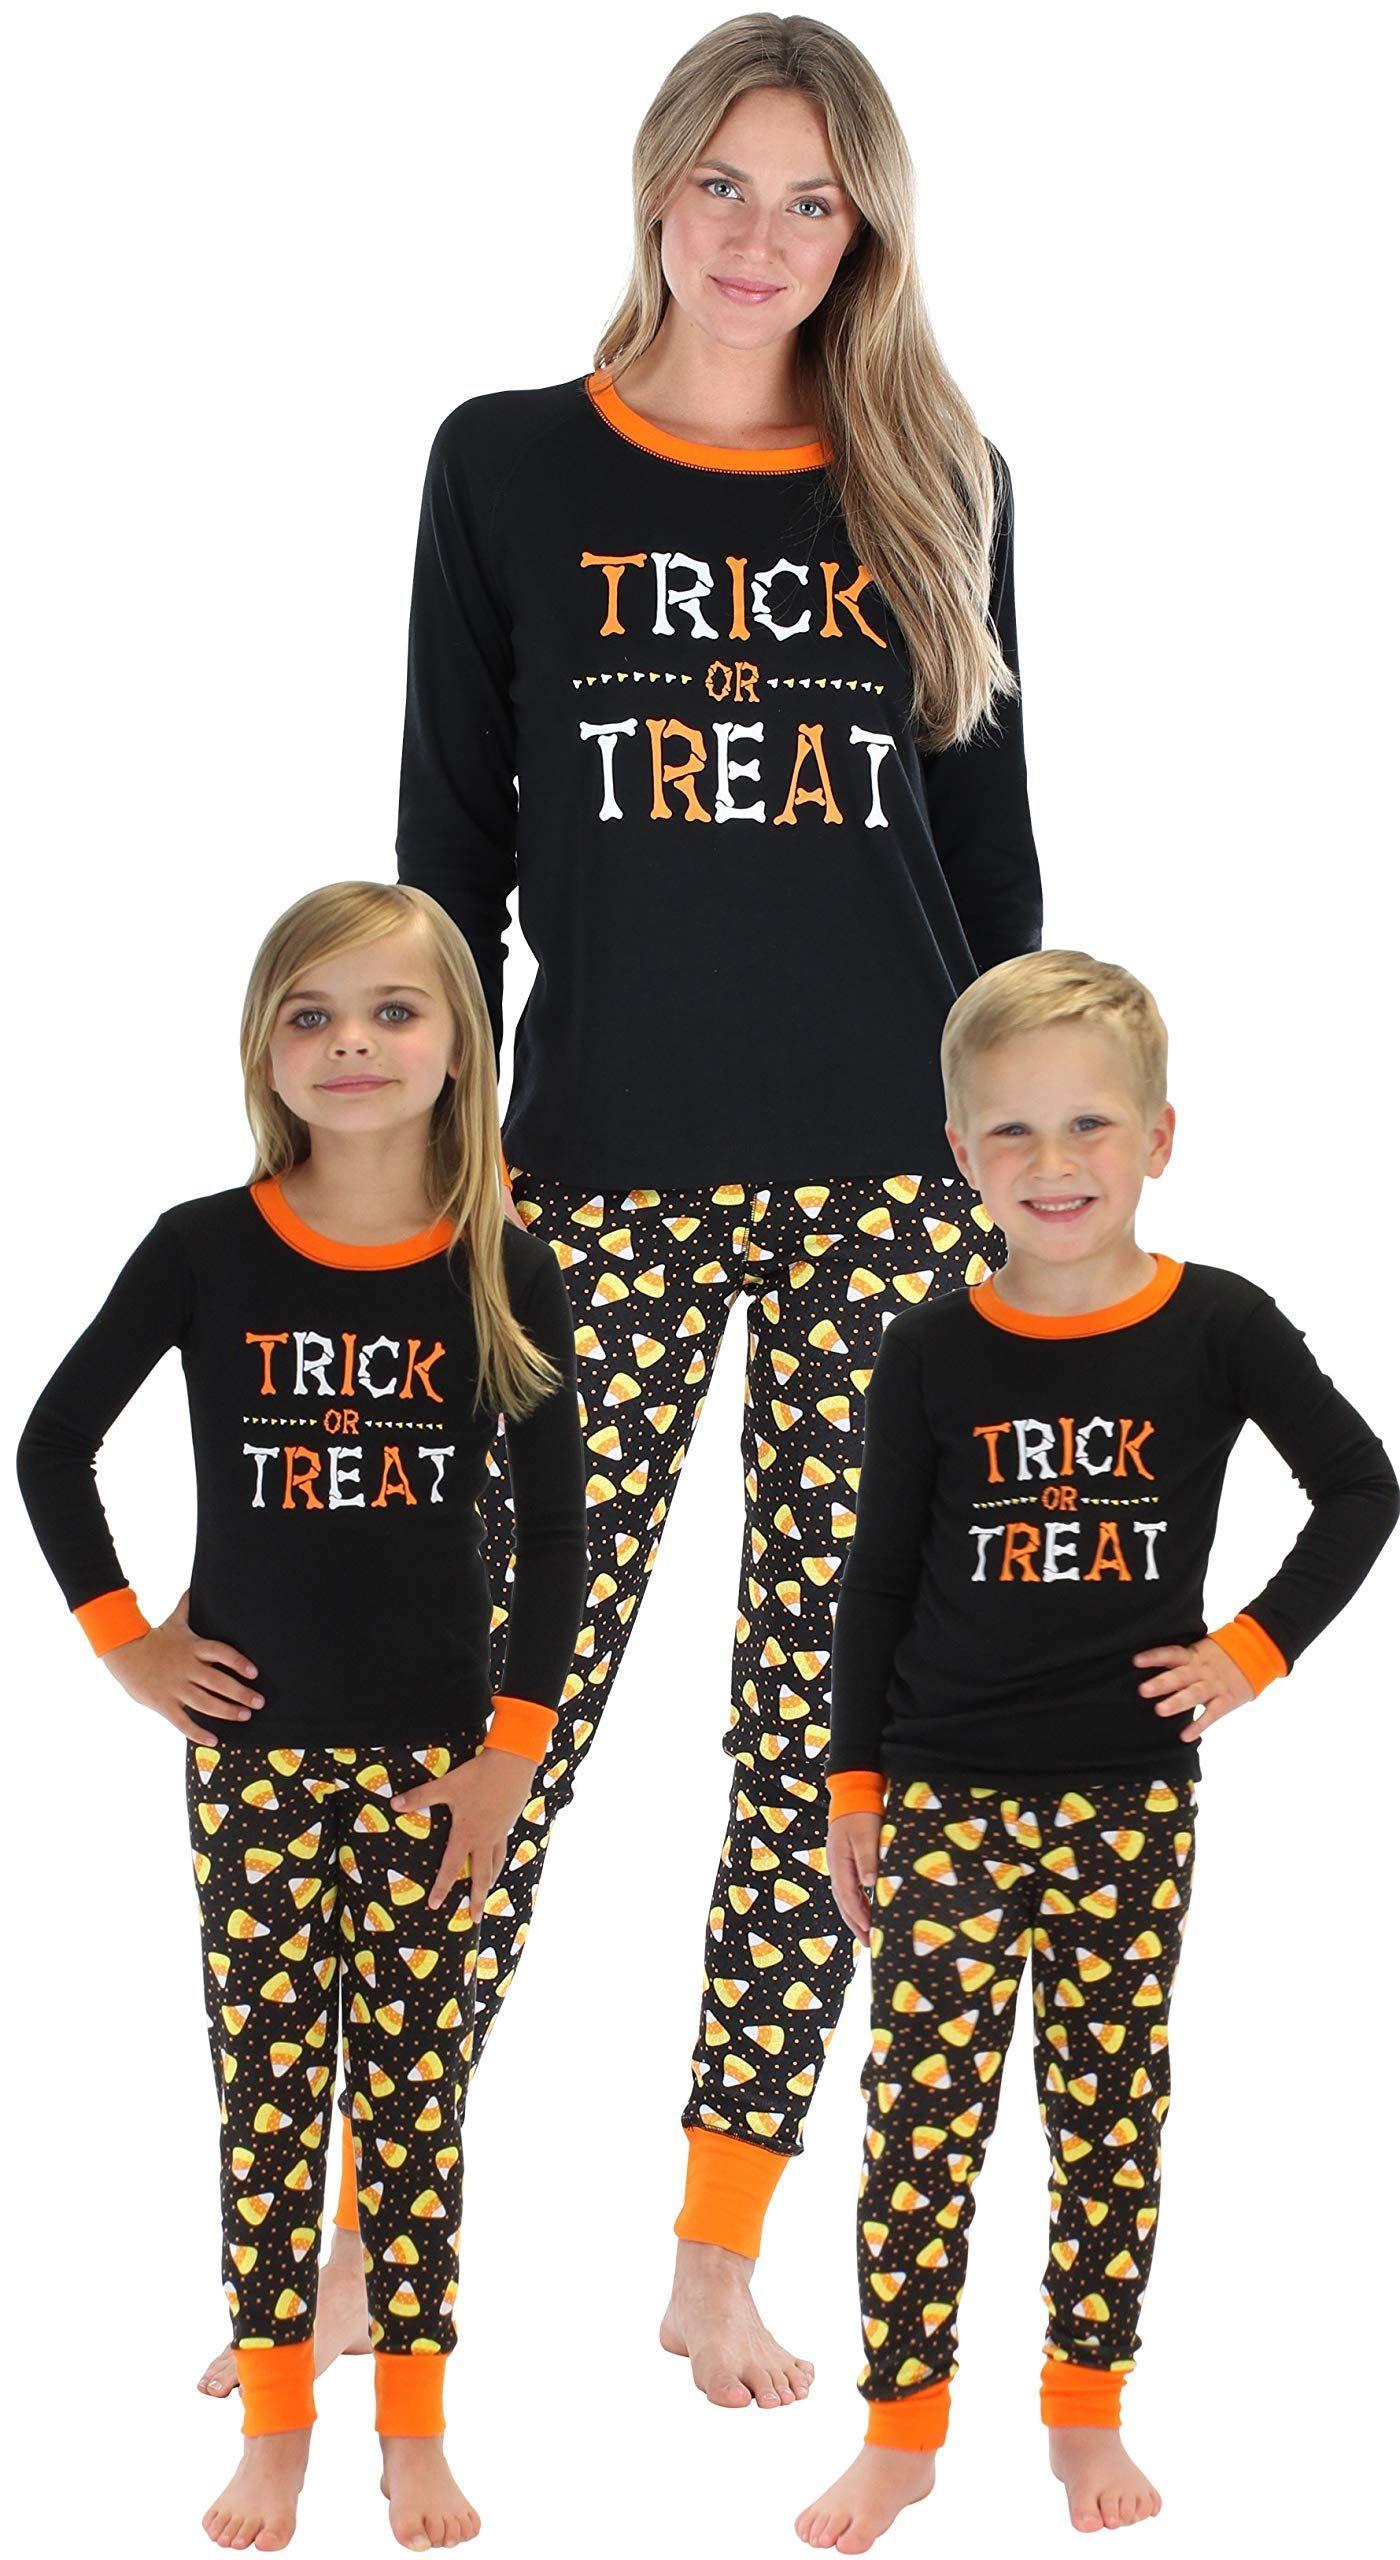 Sleepyheads Halloween TrickorTreat Family Matching